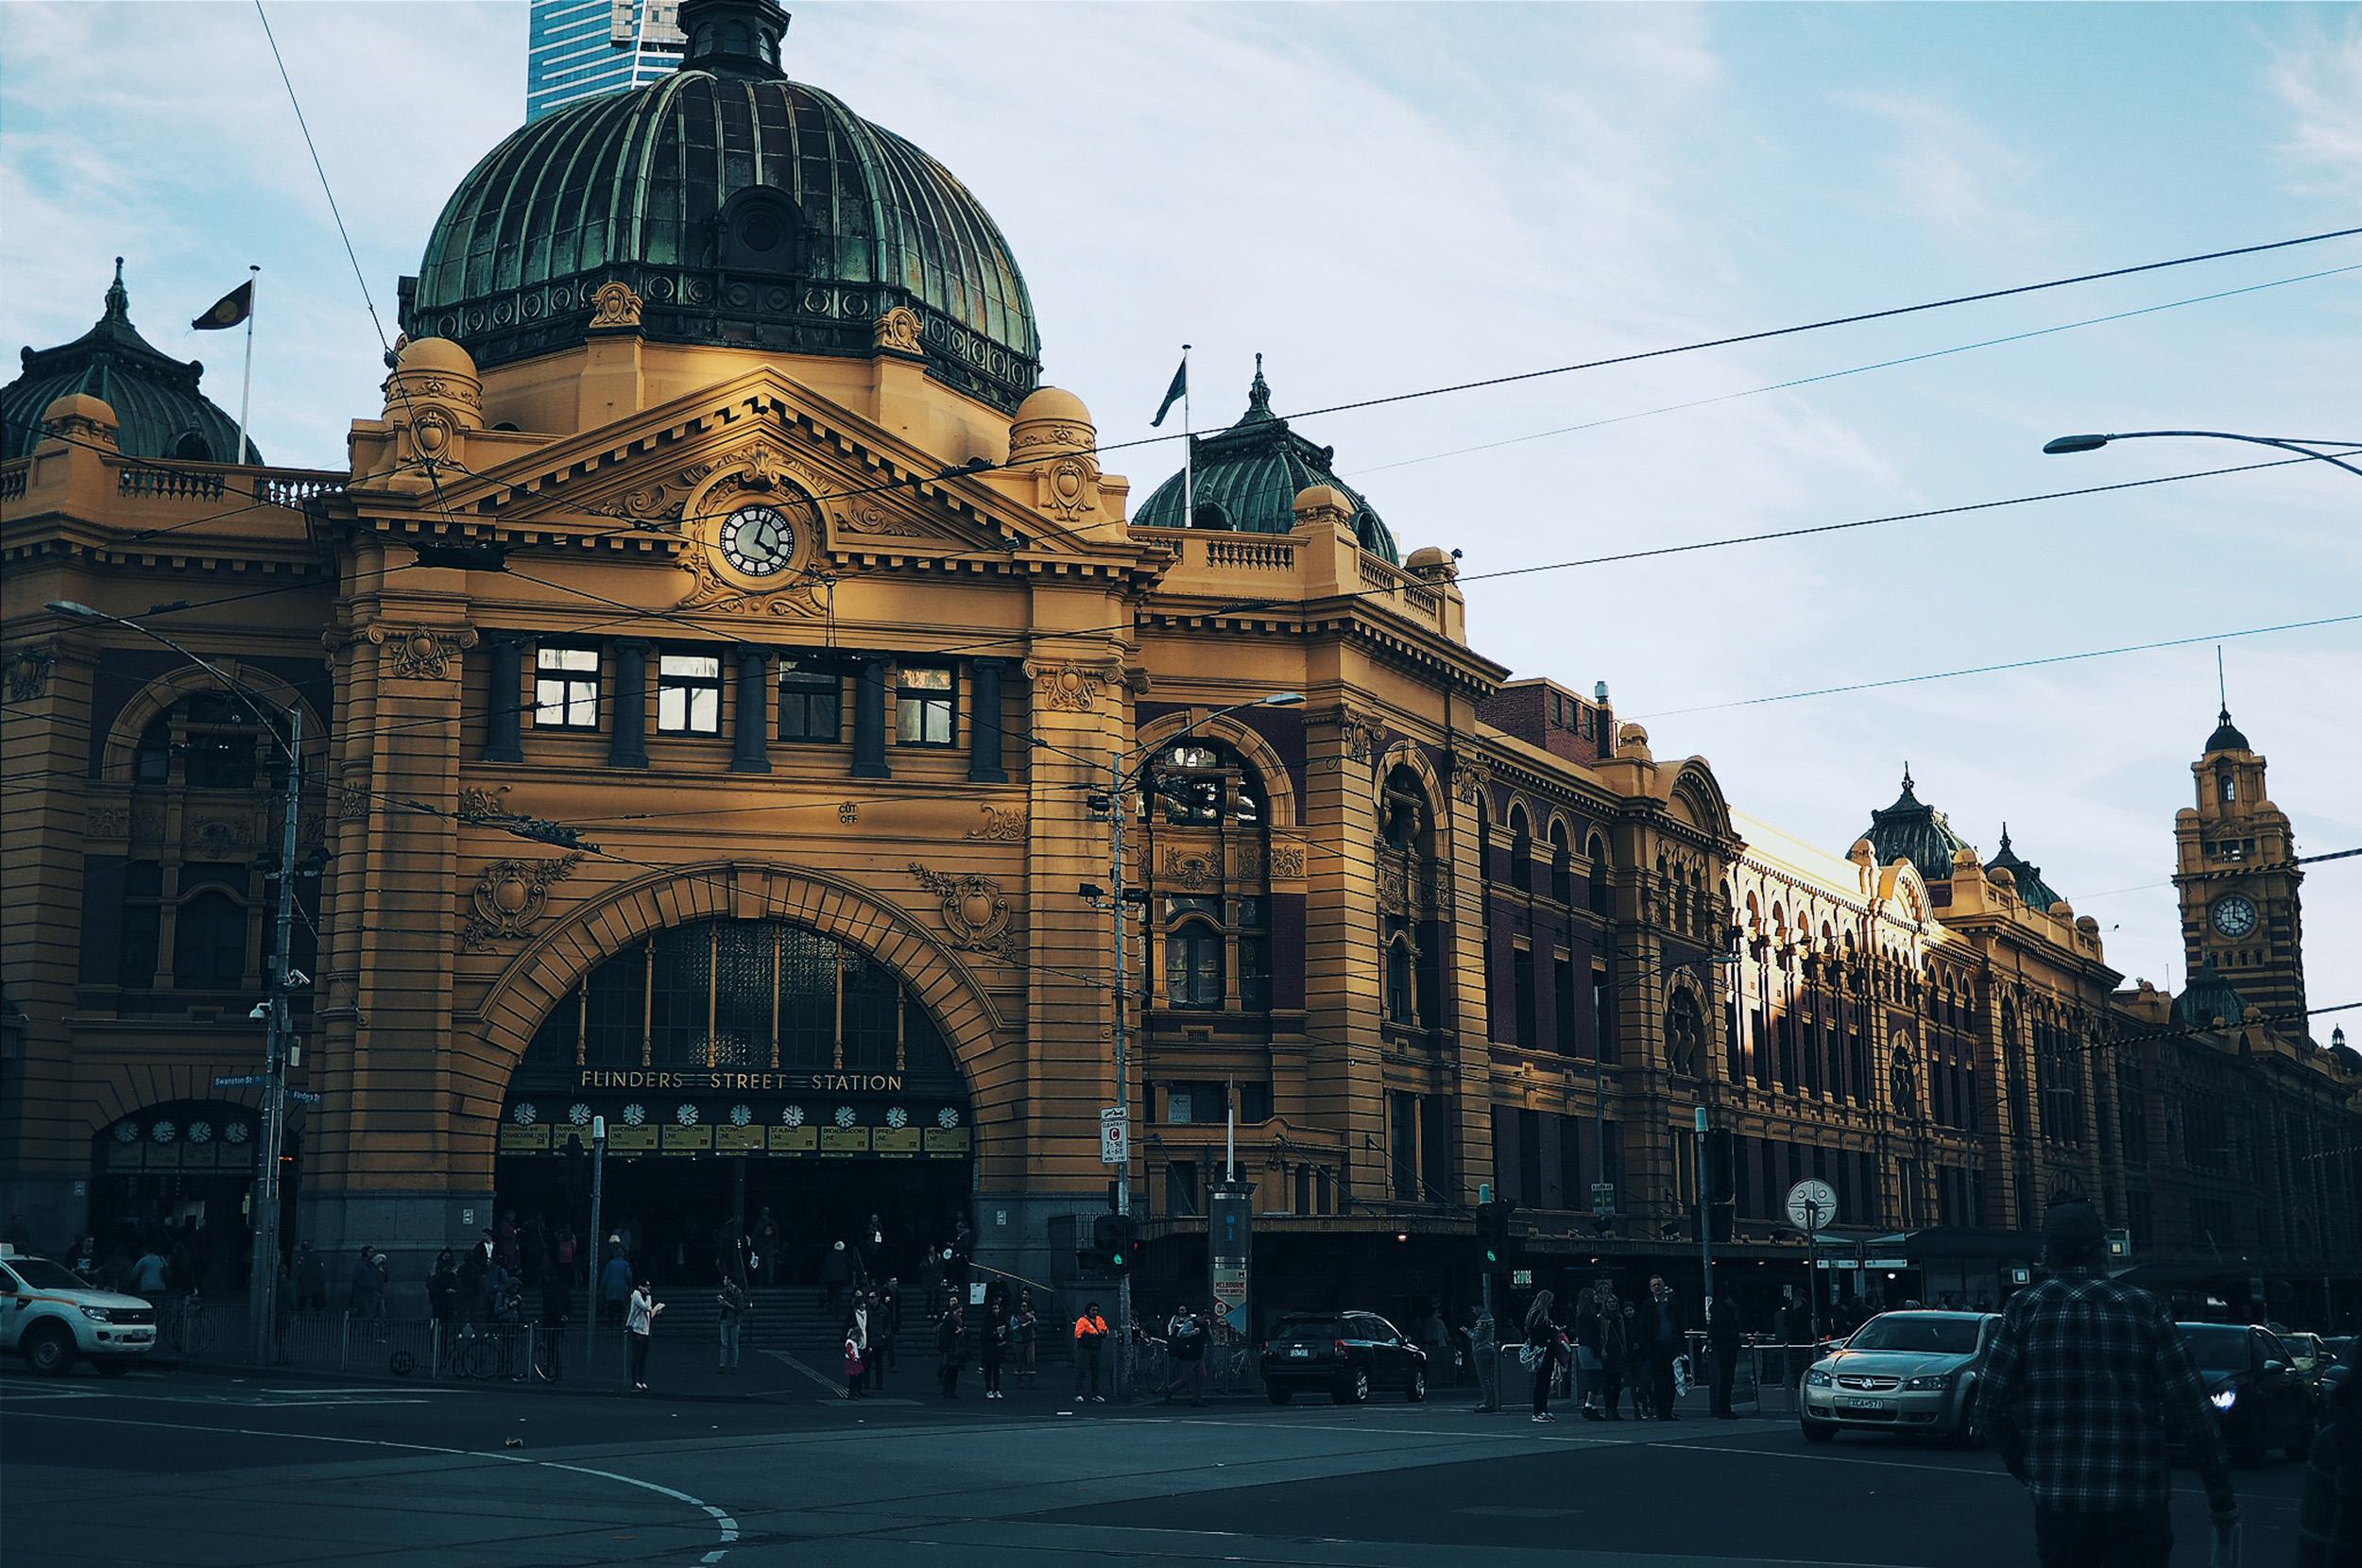 MELBOURNE IS ALREADY THE VEGAN CAPITAL OF AUSTRALIA -